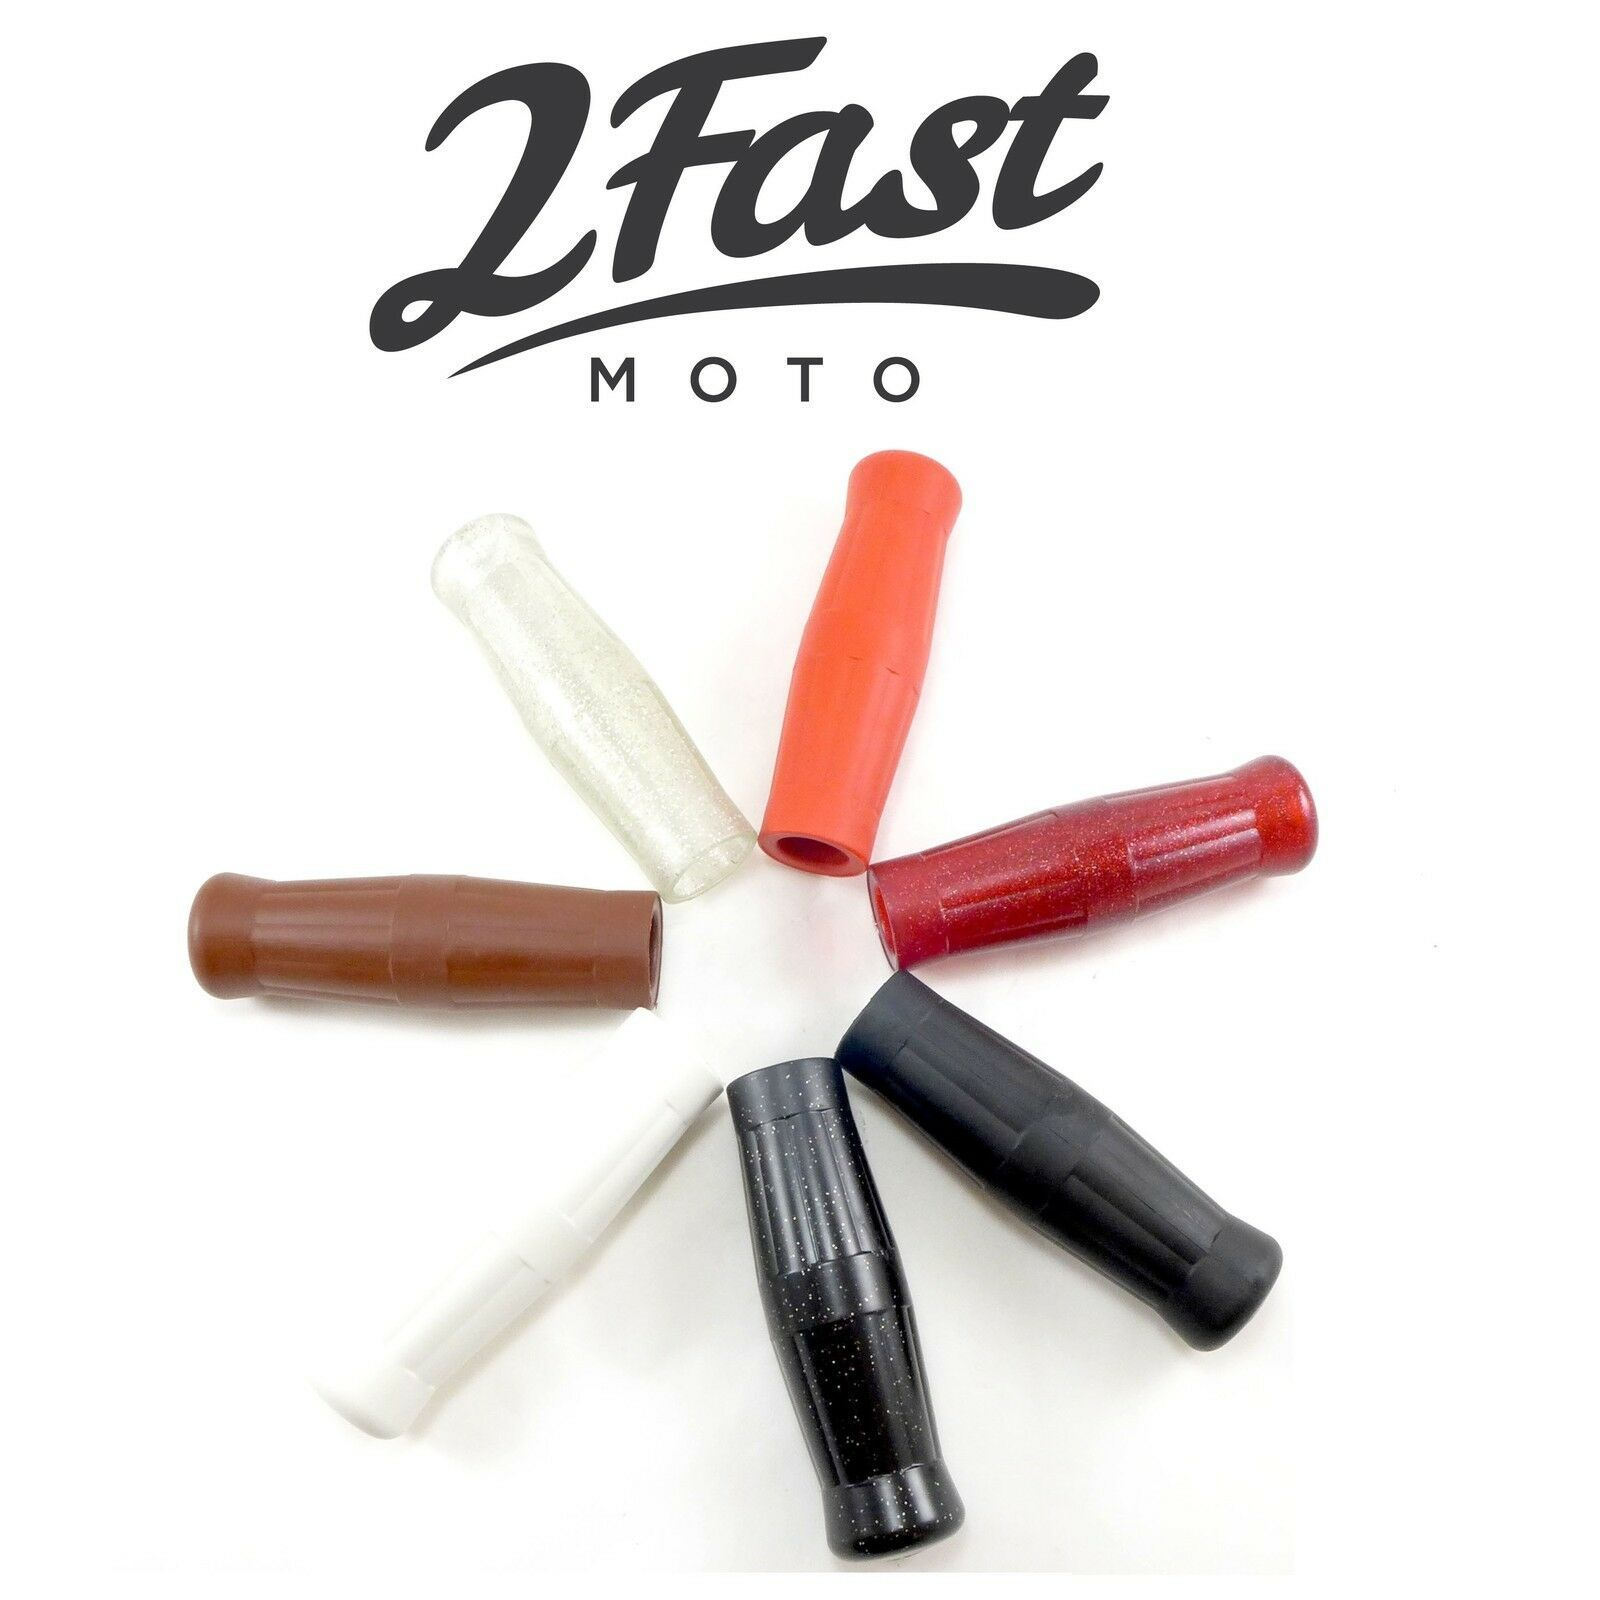 "2FastMoto Coke Bottle Grips 1/"" Handlebars Old School Cruiser Harley Davidson"